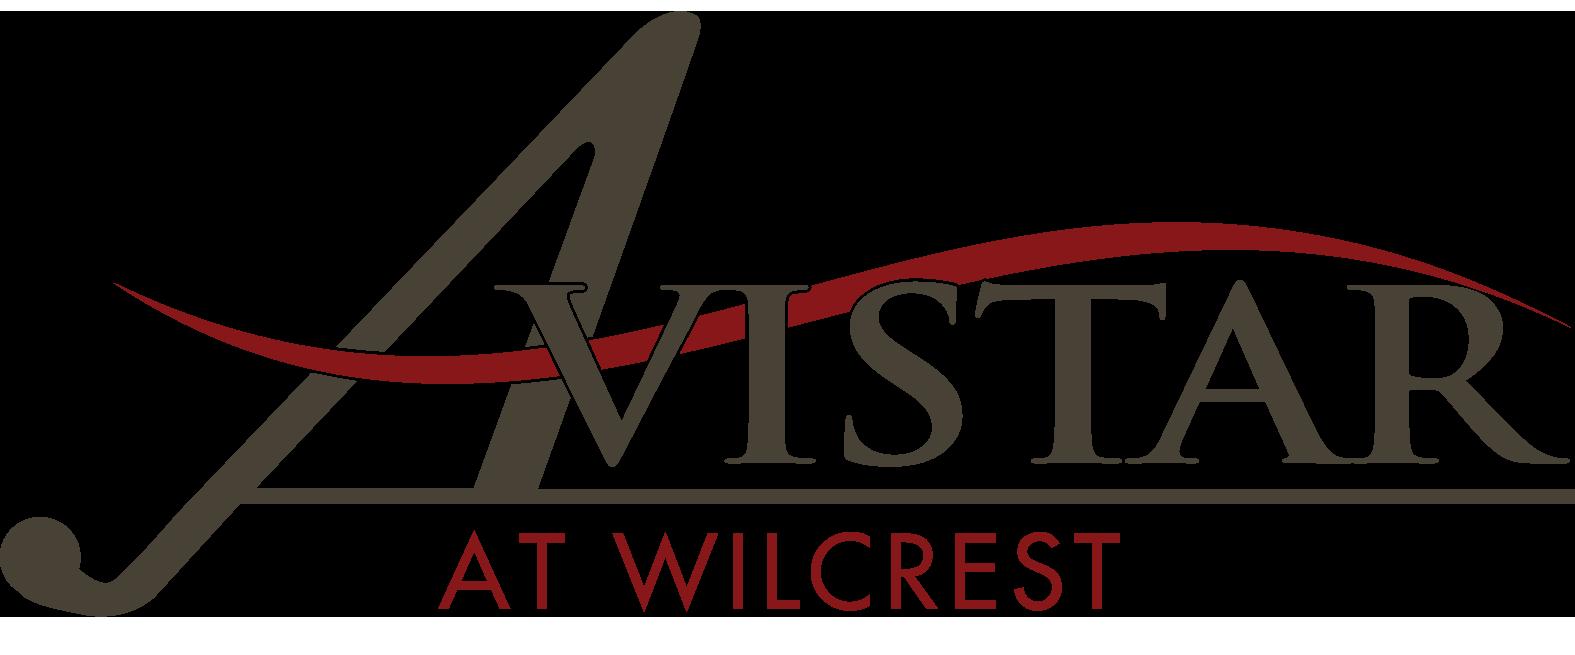 Avistar at Wilcrest Logo